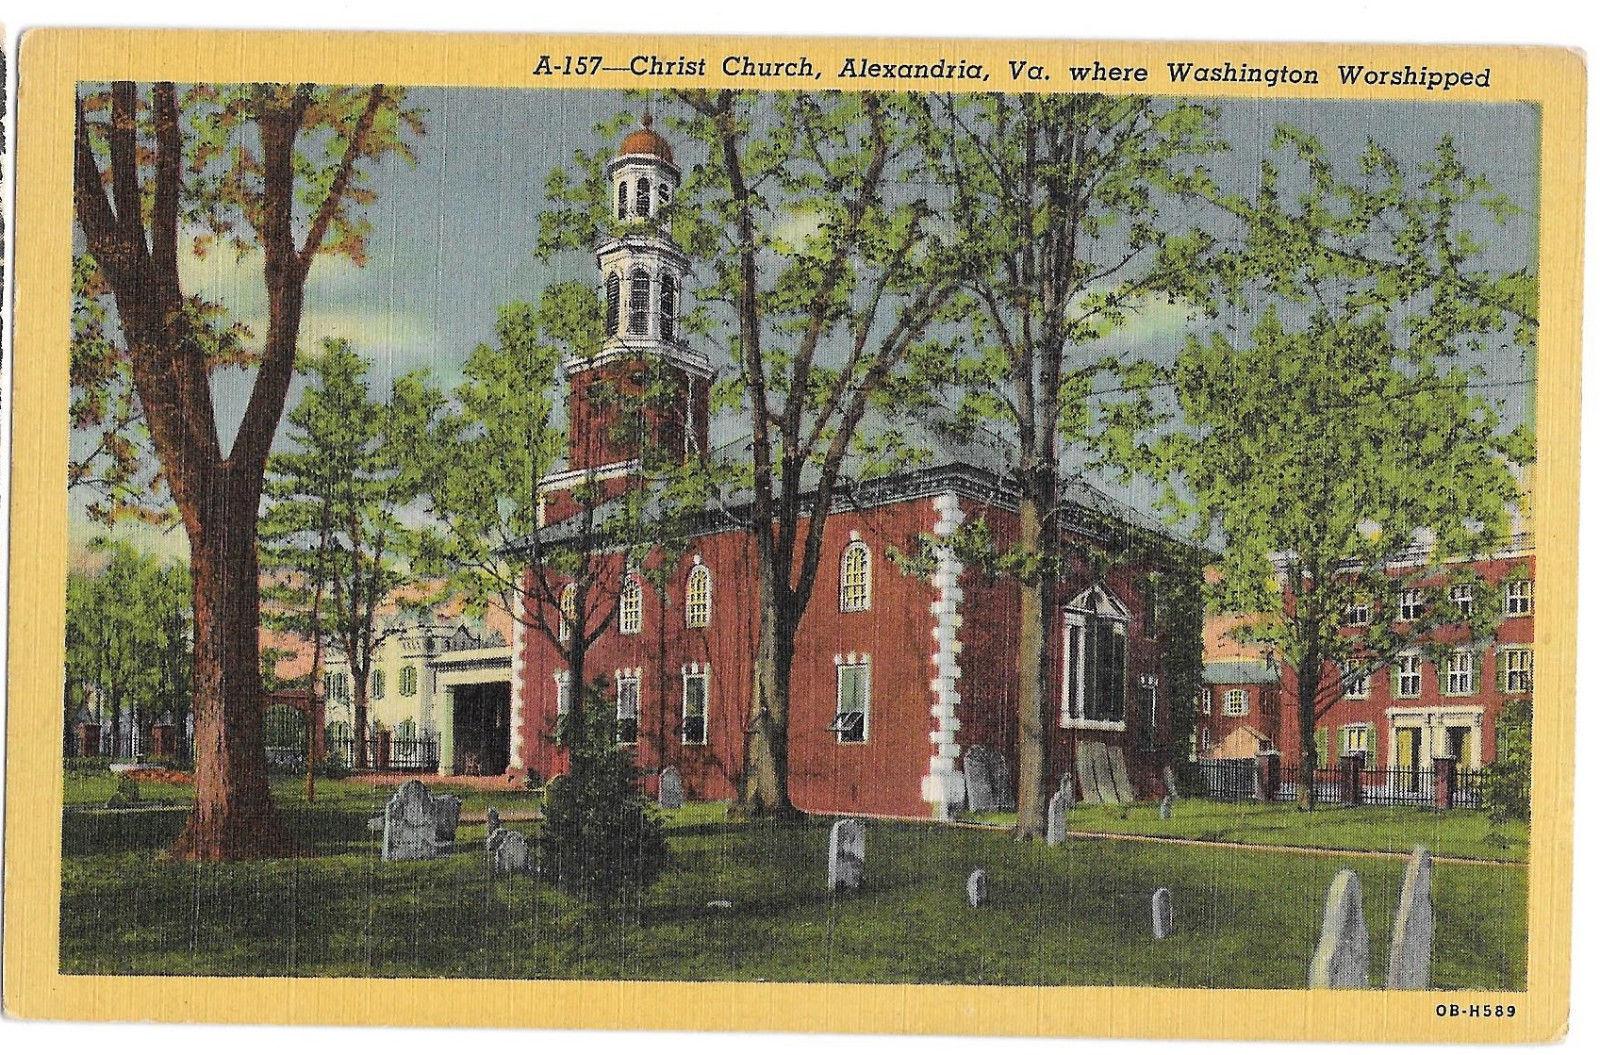 VA Alexandria Christ Church George Washington Worshipped Here Vtg Linen Postcard